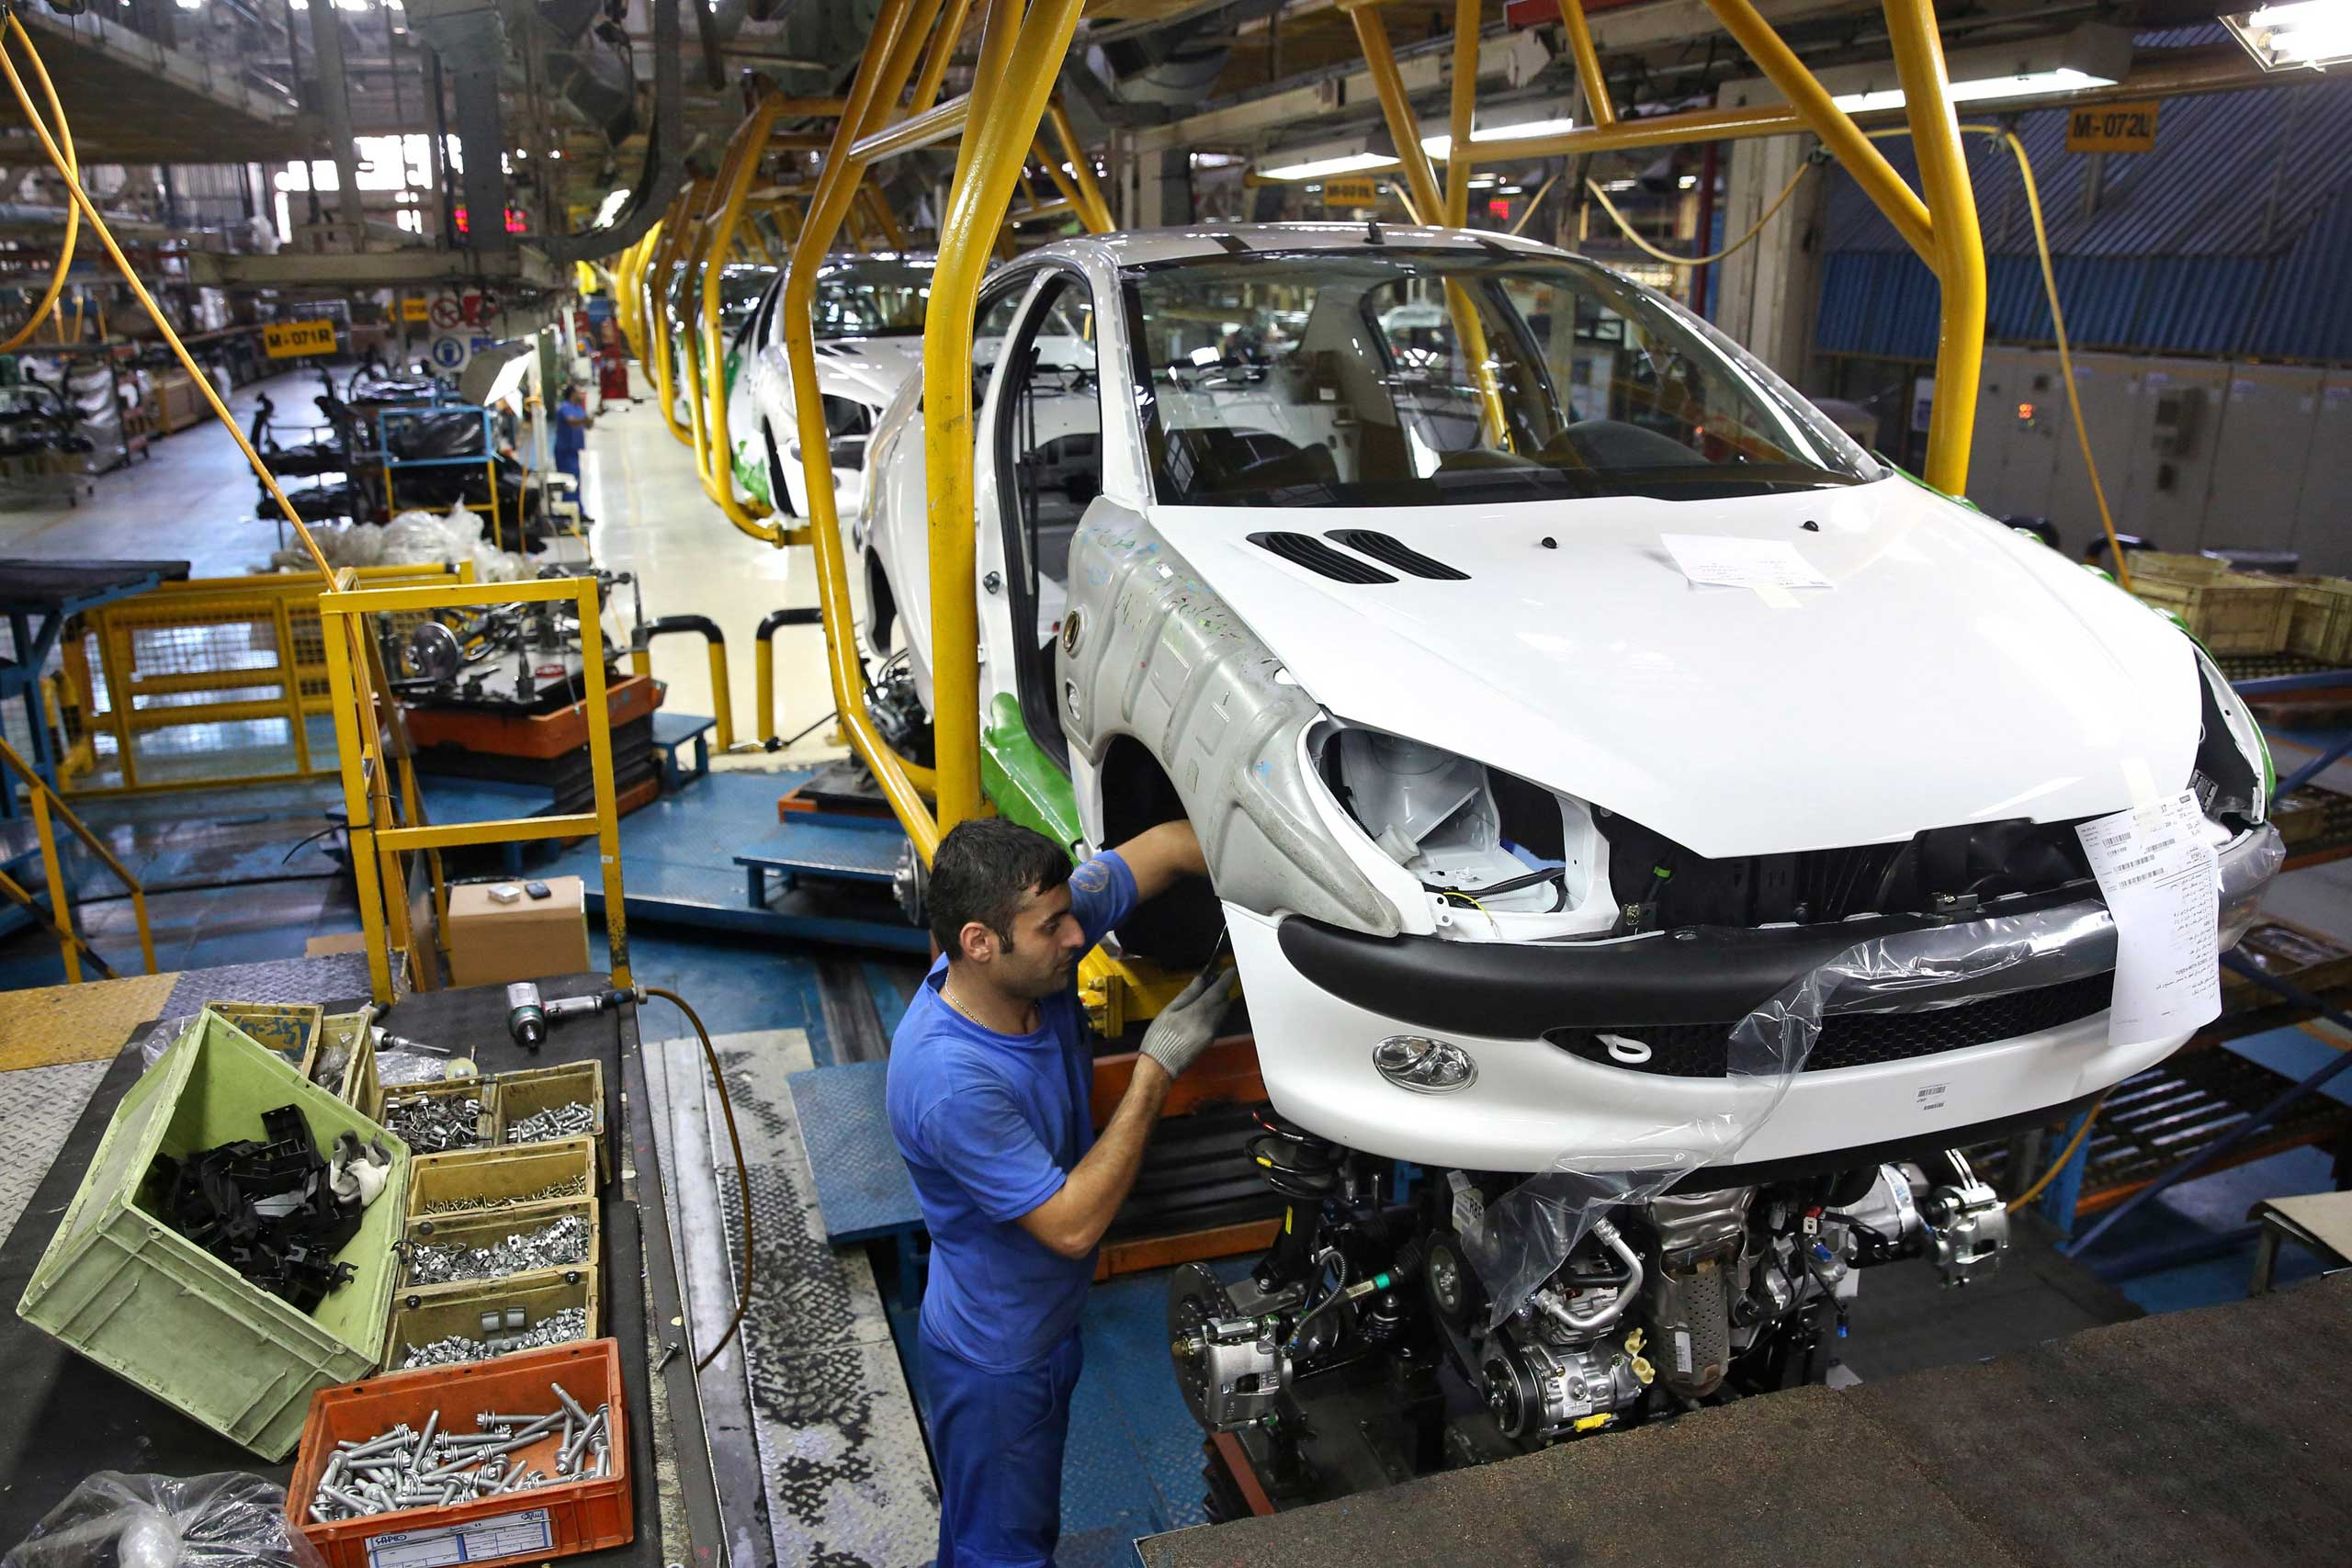 An Iranian worker assembles a Peugeot 206 at the state-run Iran-Khodro automobile manufacturing plant near Tehran, Iran, Oct. 11, 2014.